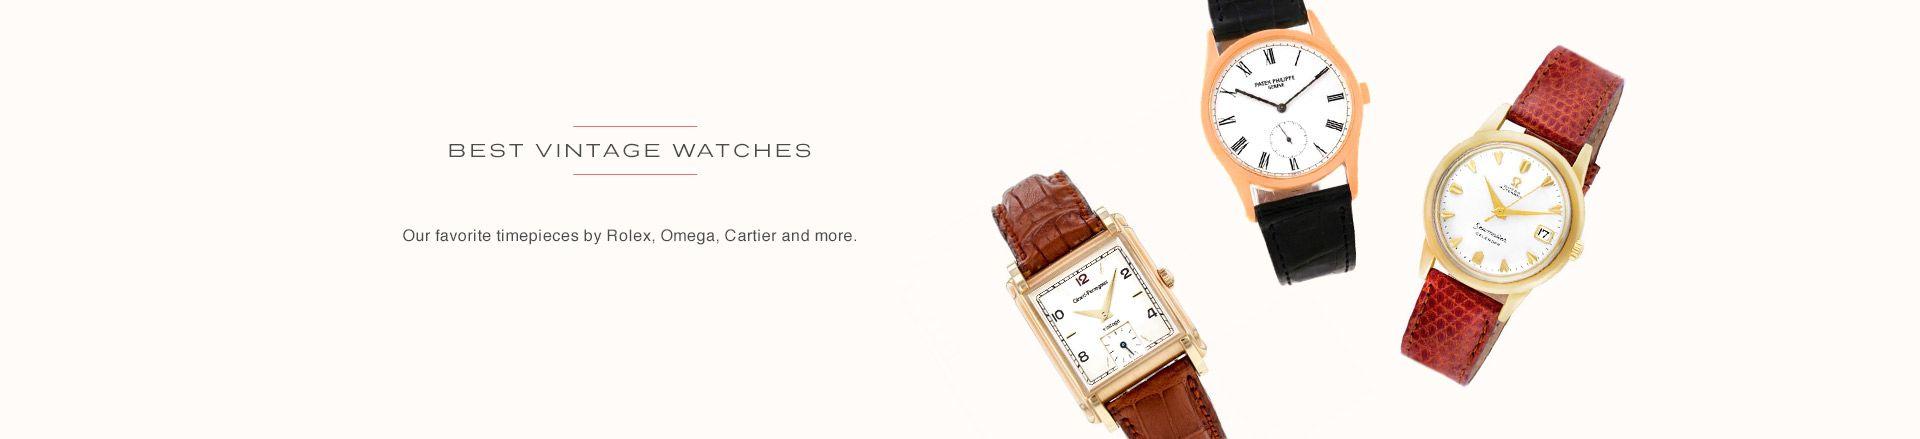 Top Vintage Watches